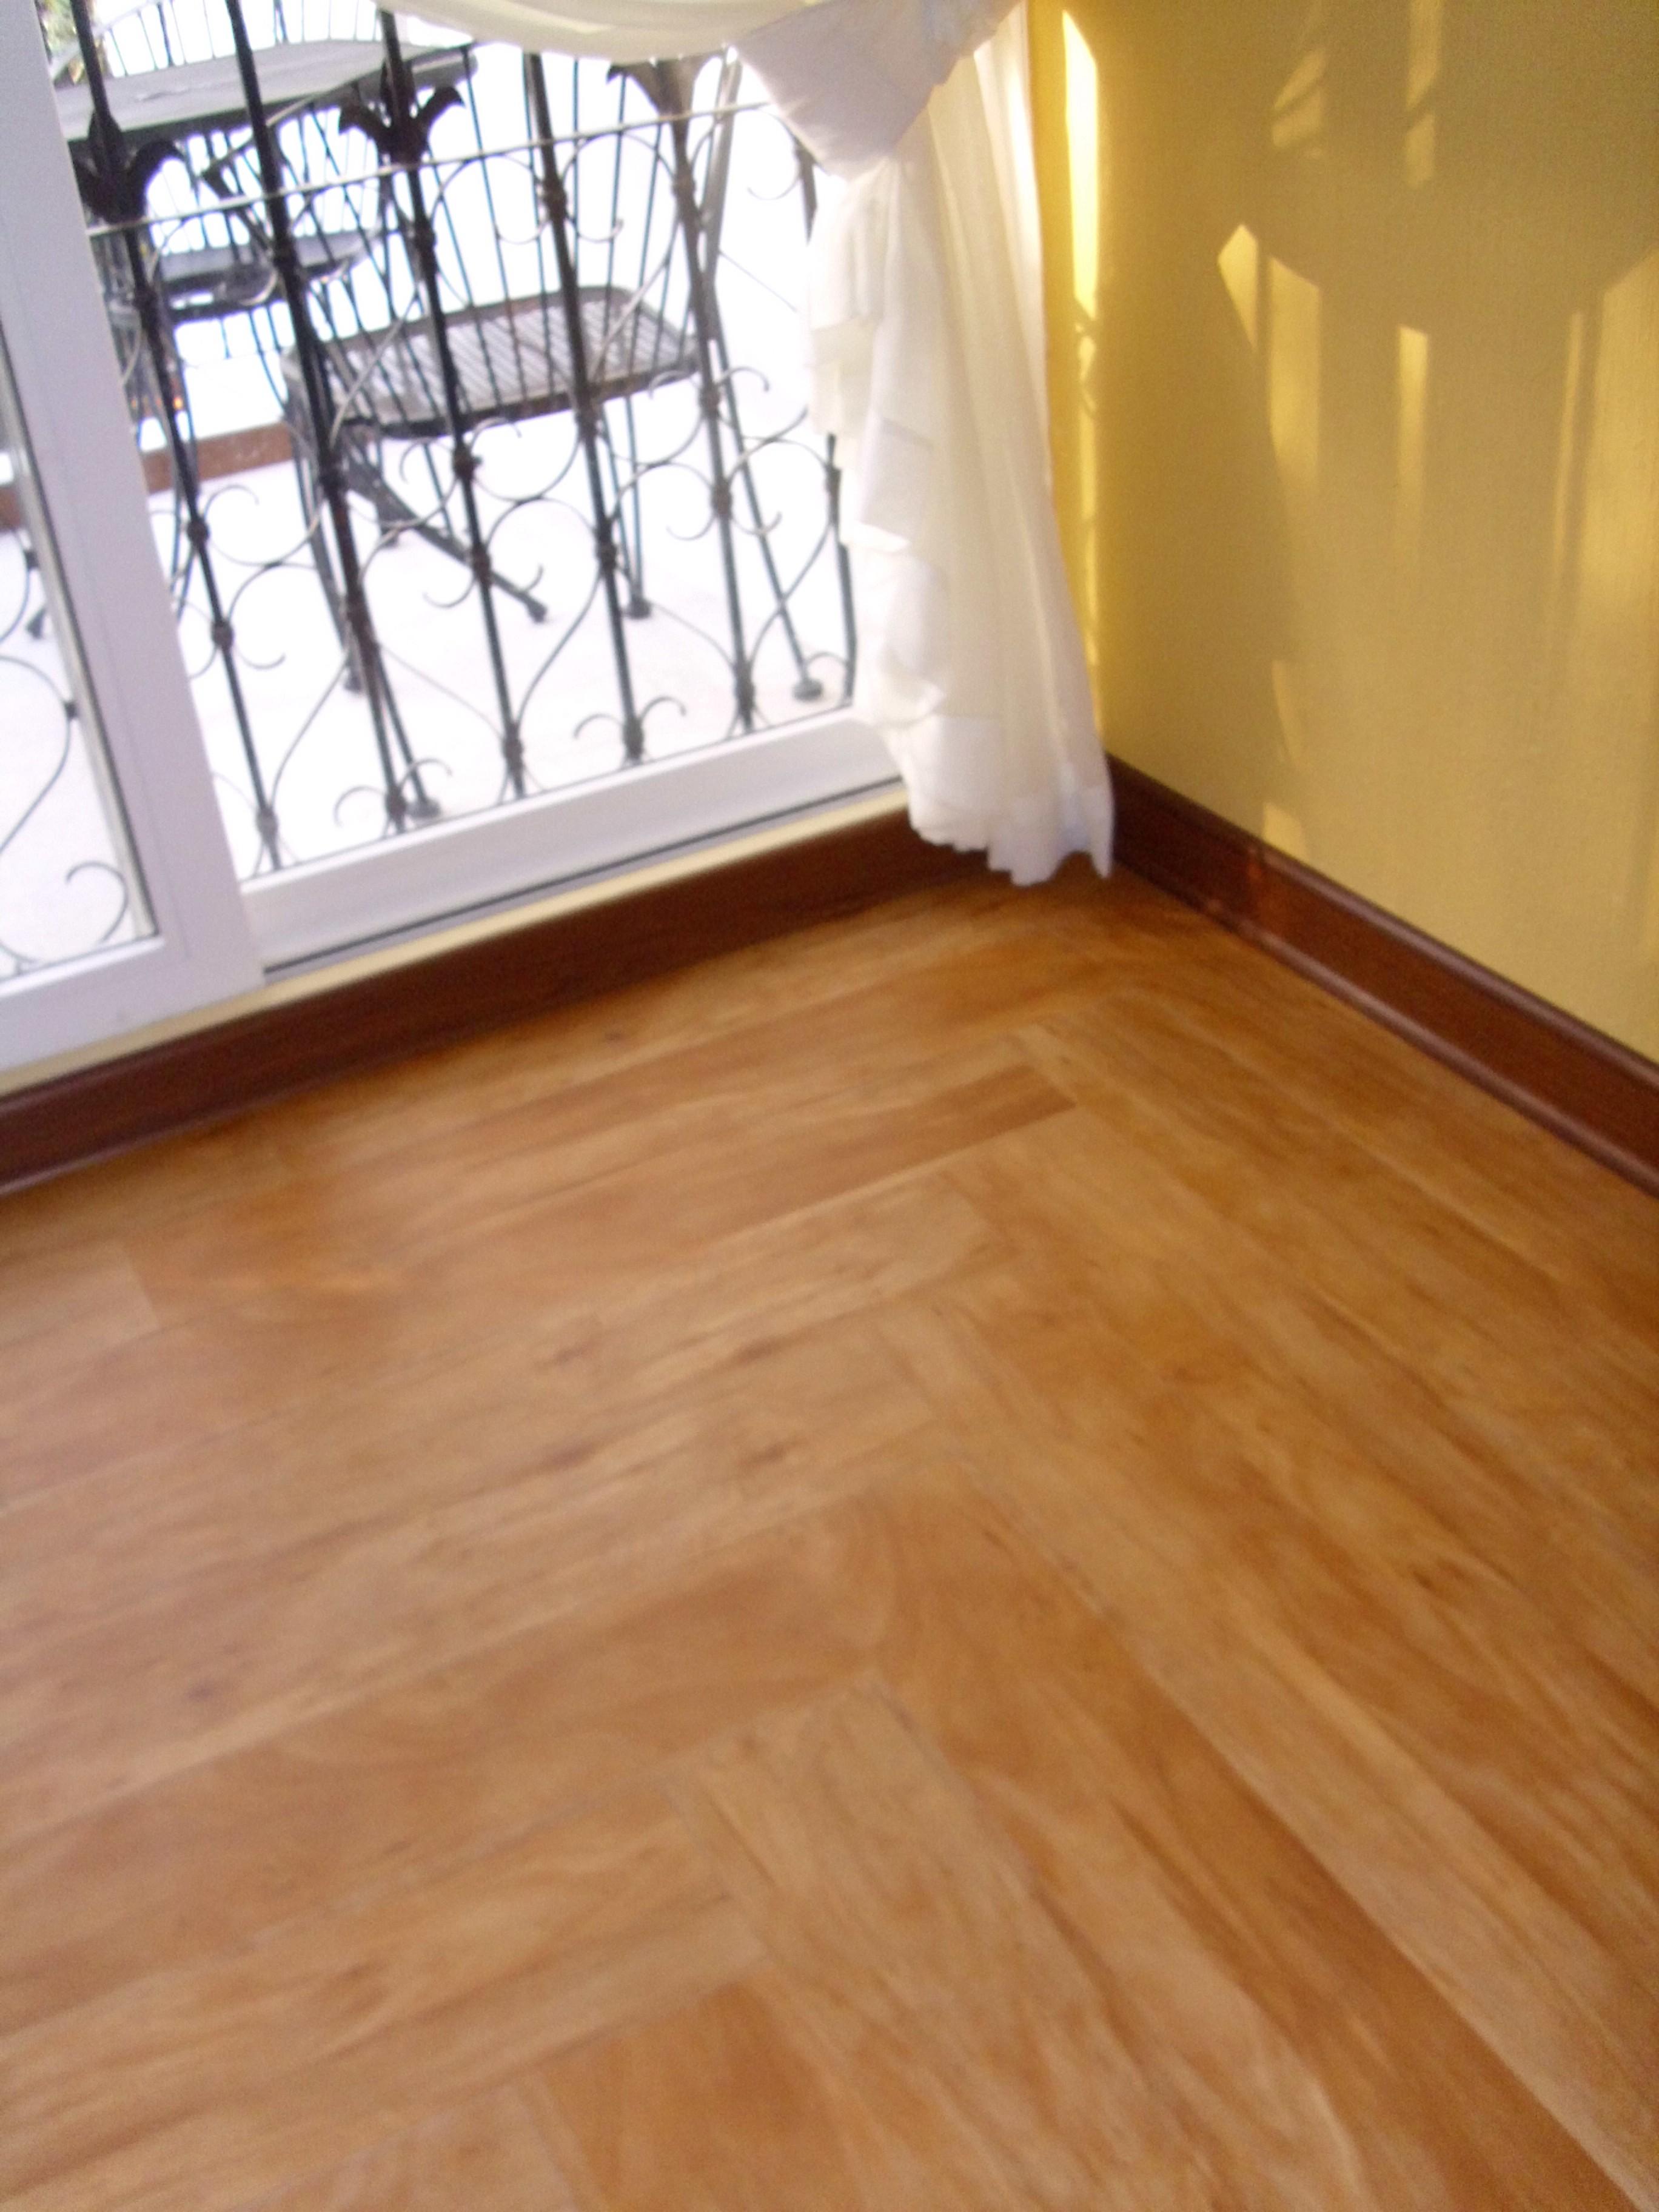 Pisos laminados de pvc imitaci n madera muebles en for Piso imitacion madera